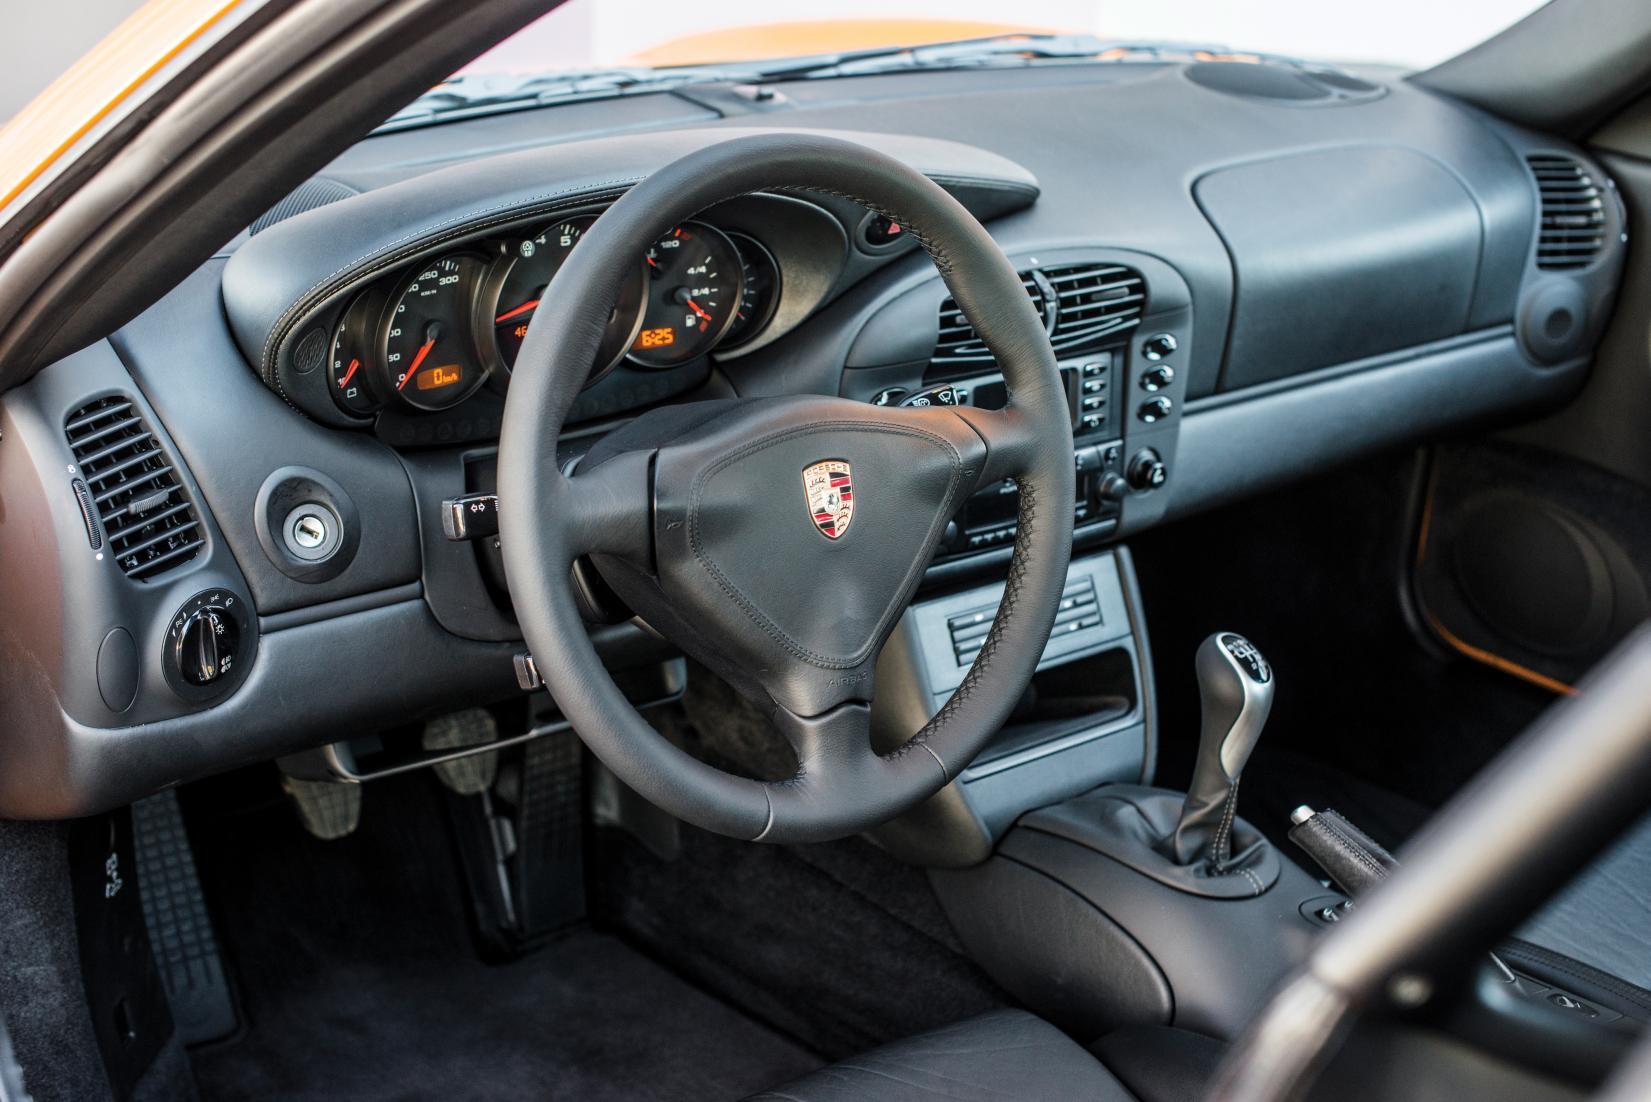 Interieur Porsche 911 Turbo 996 2001